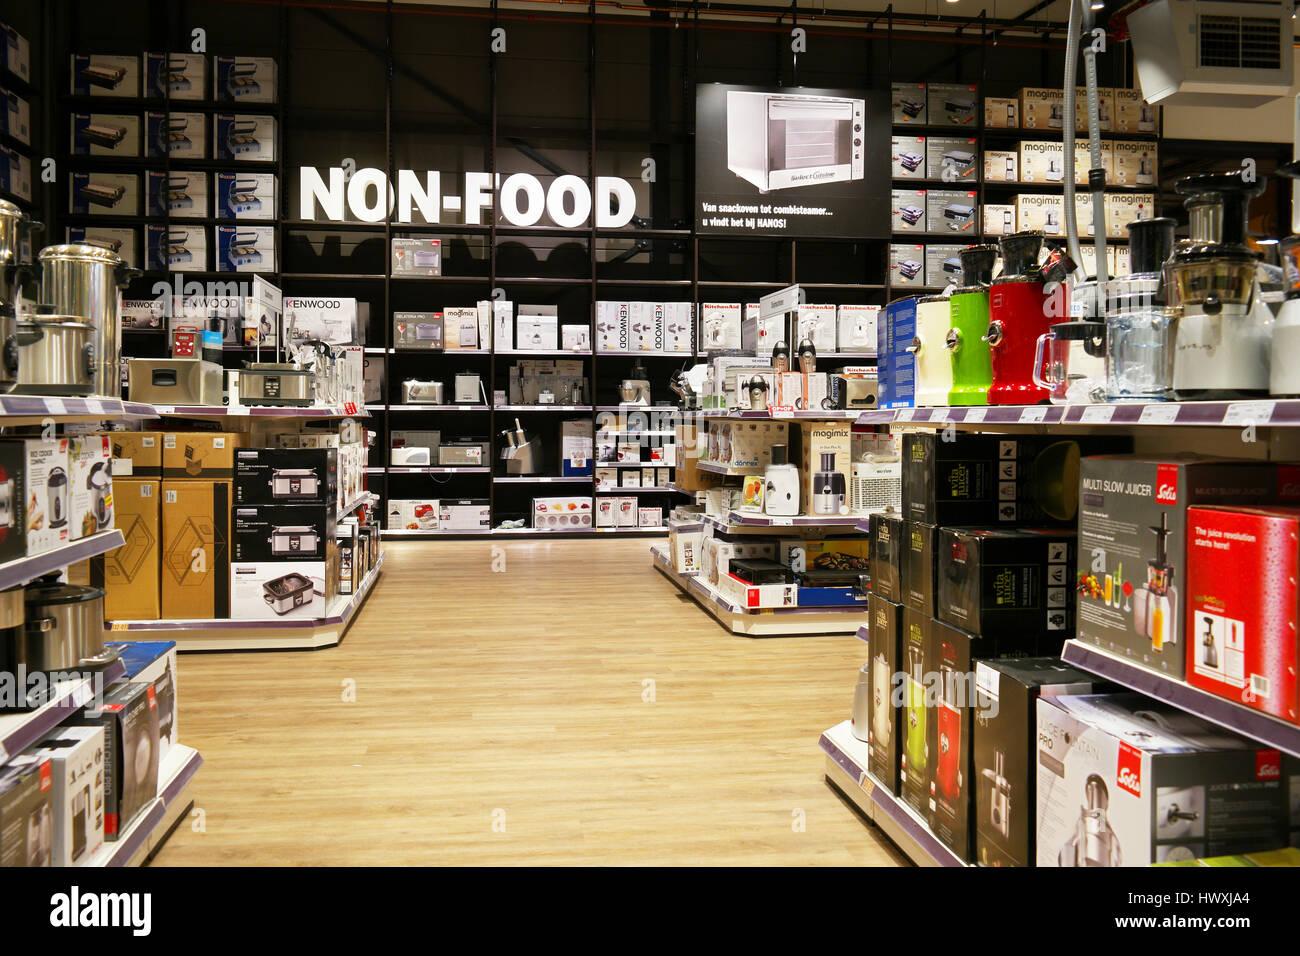 Non Food Department Stock Photos & Non Food Department ...